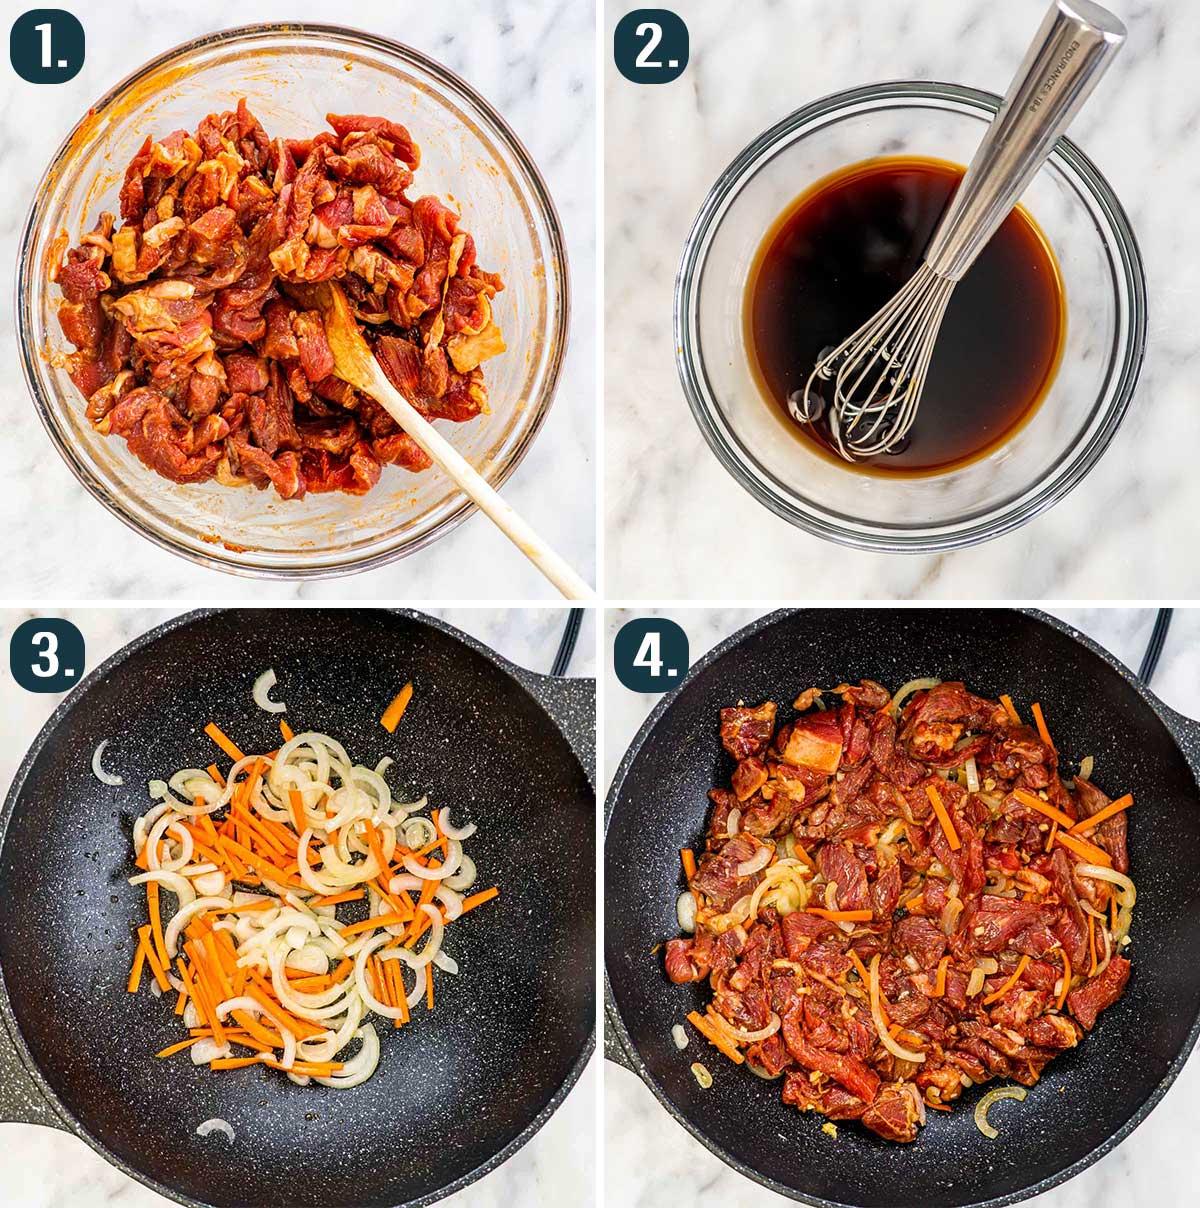 process shots showing how to make korean beef stir fry.